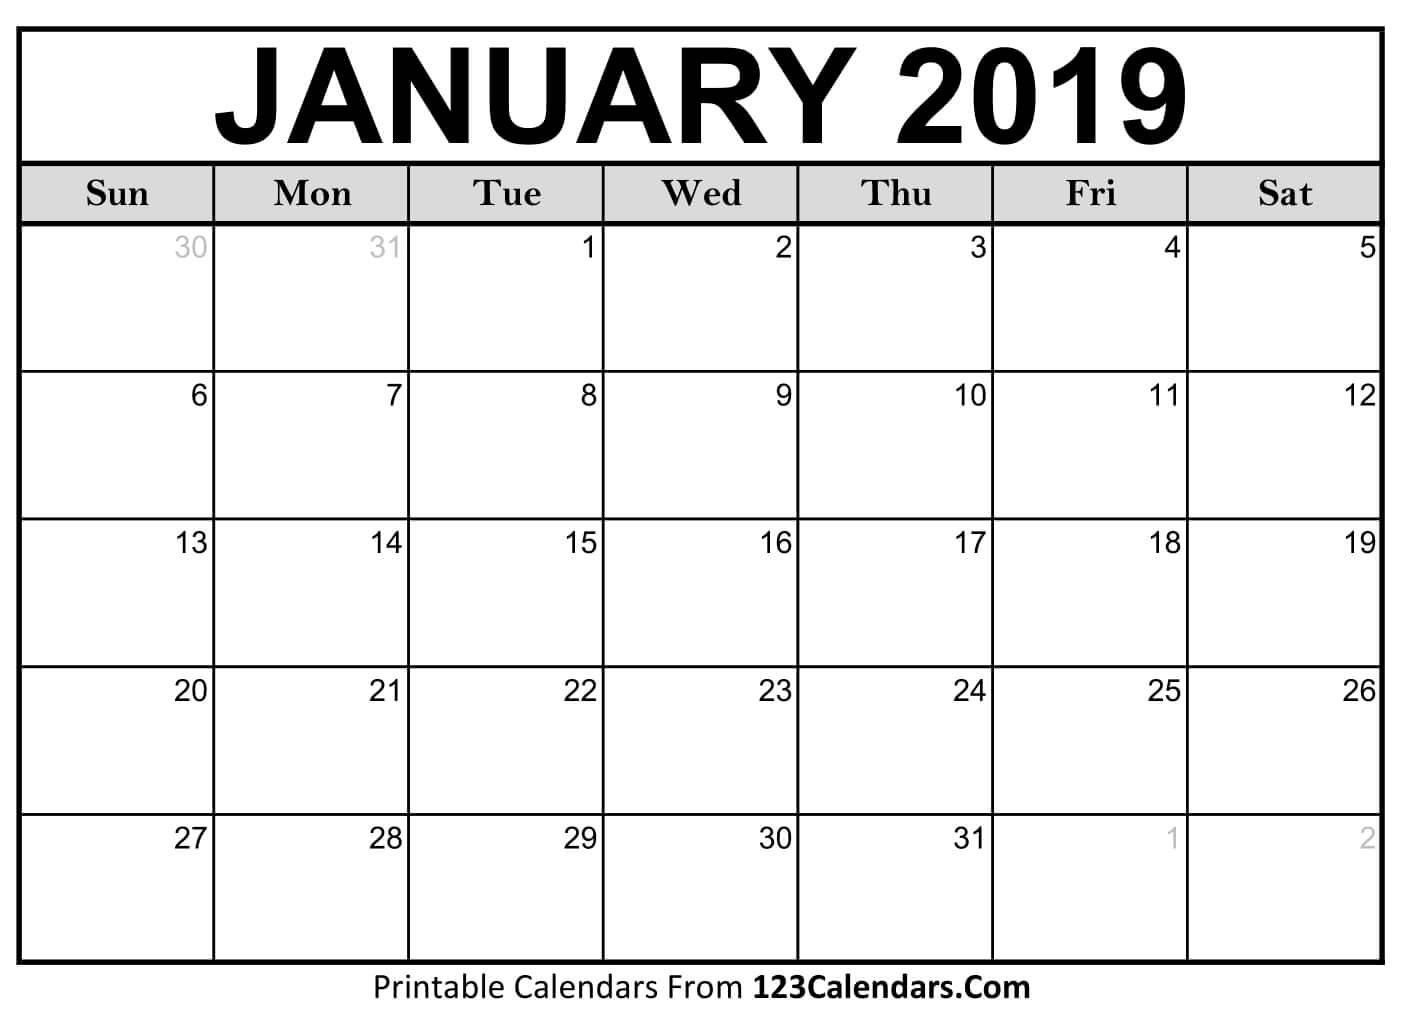 Printable January 2019 Calendar Templates – 123Calendars 2019 Calendars